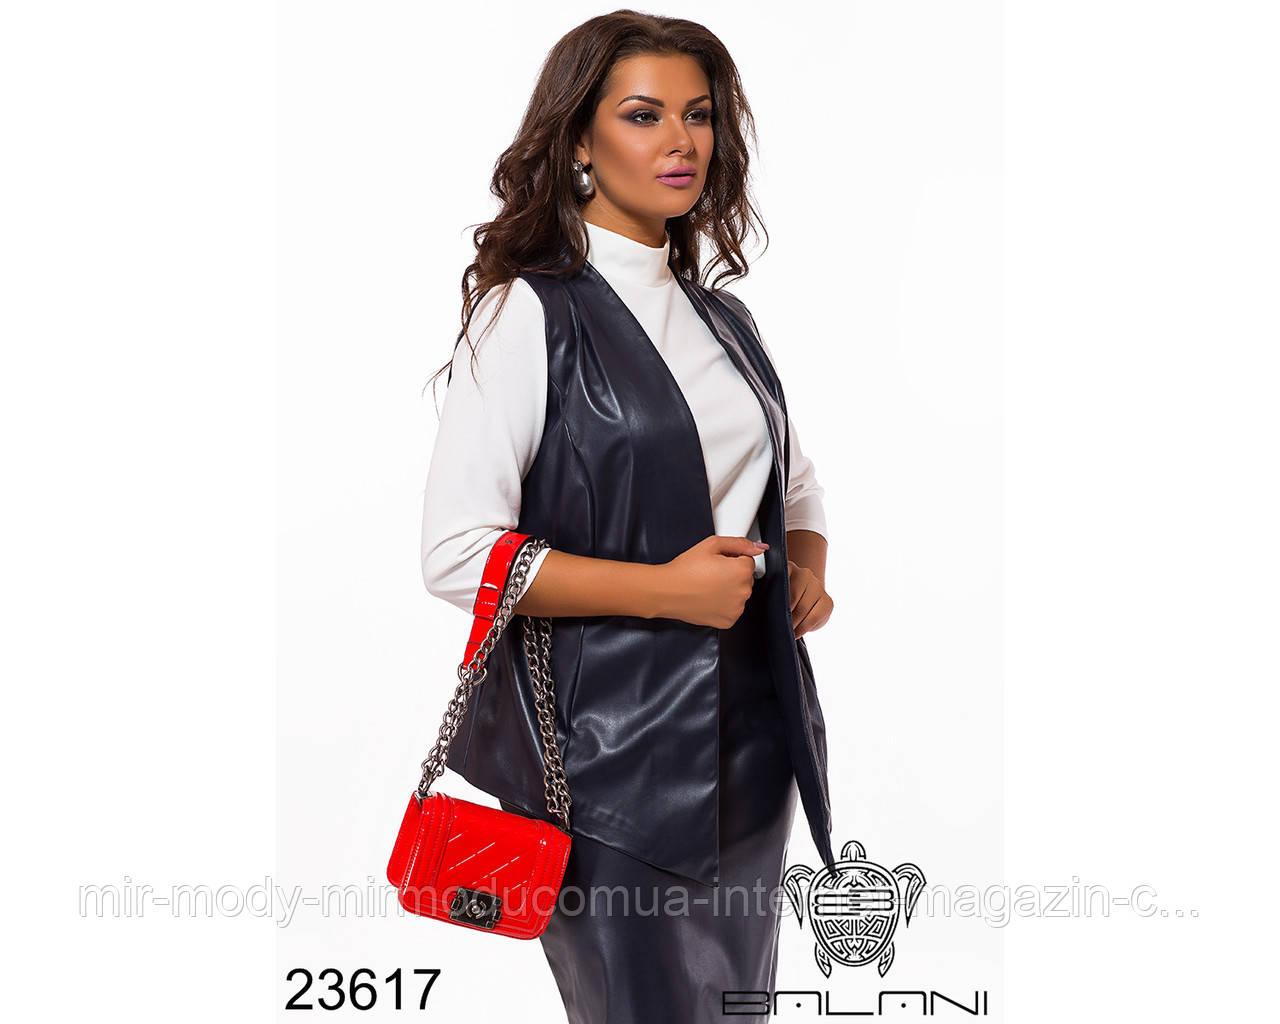 Юбочный костюм тройка- 23617 с 48 по 54 размер(бн)